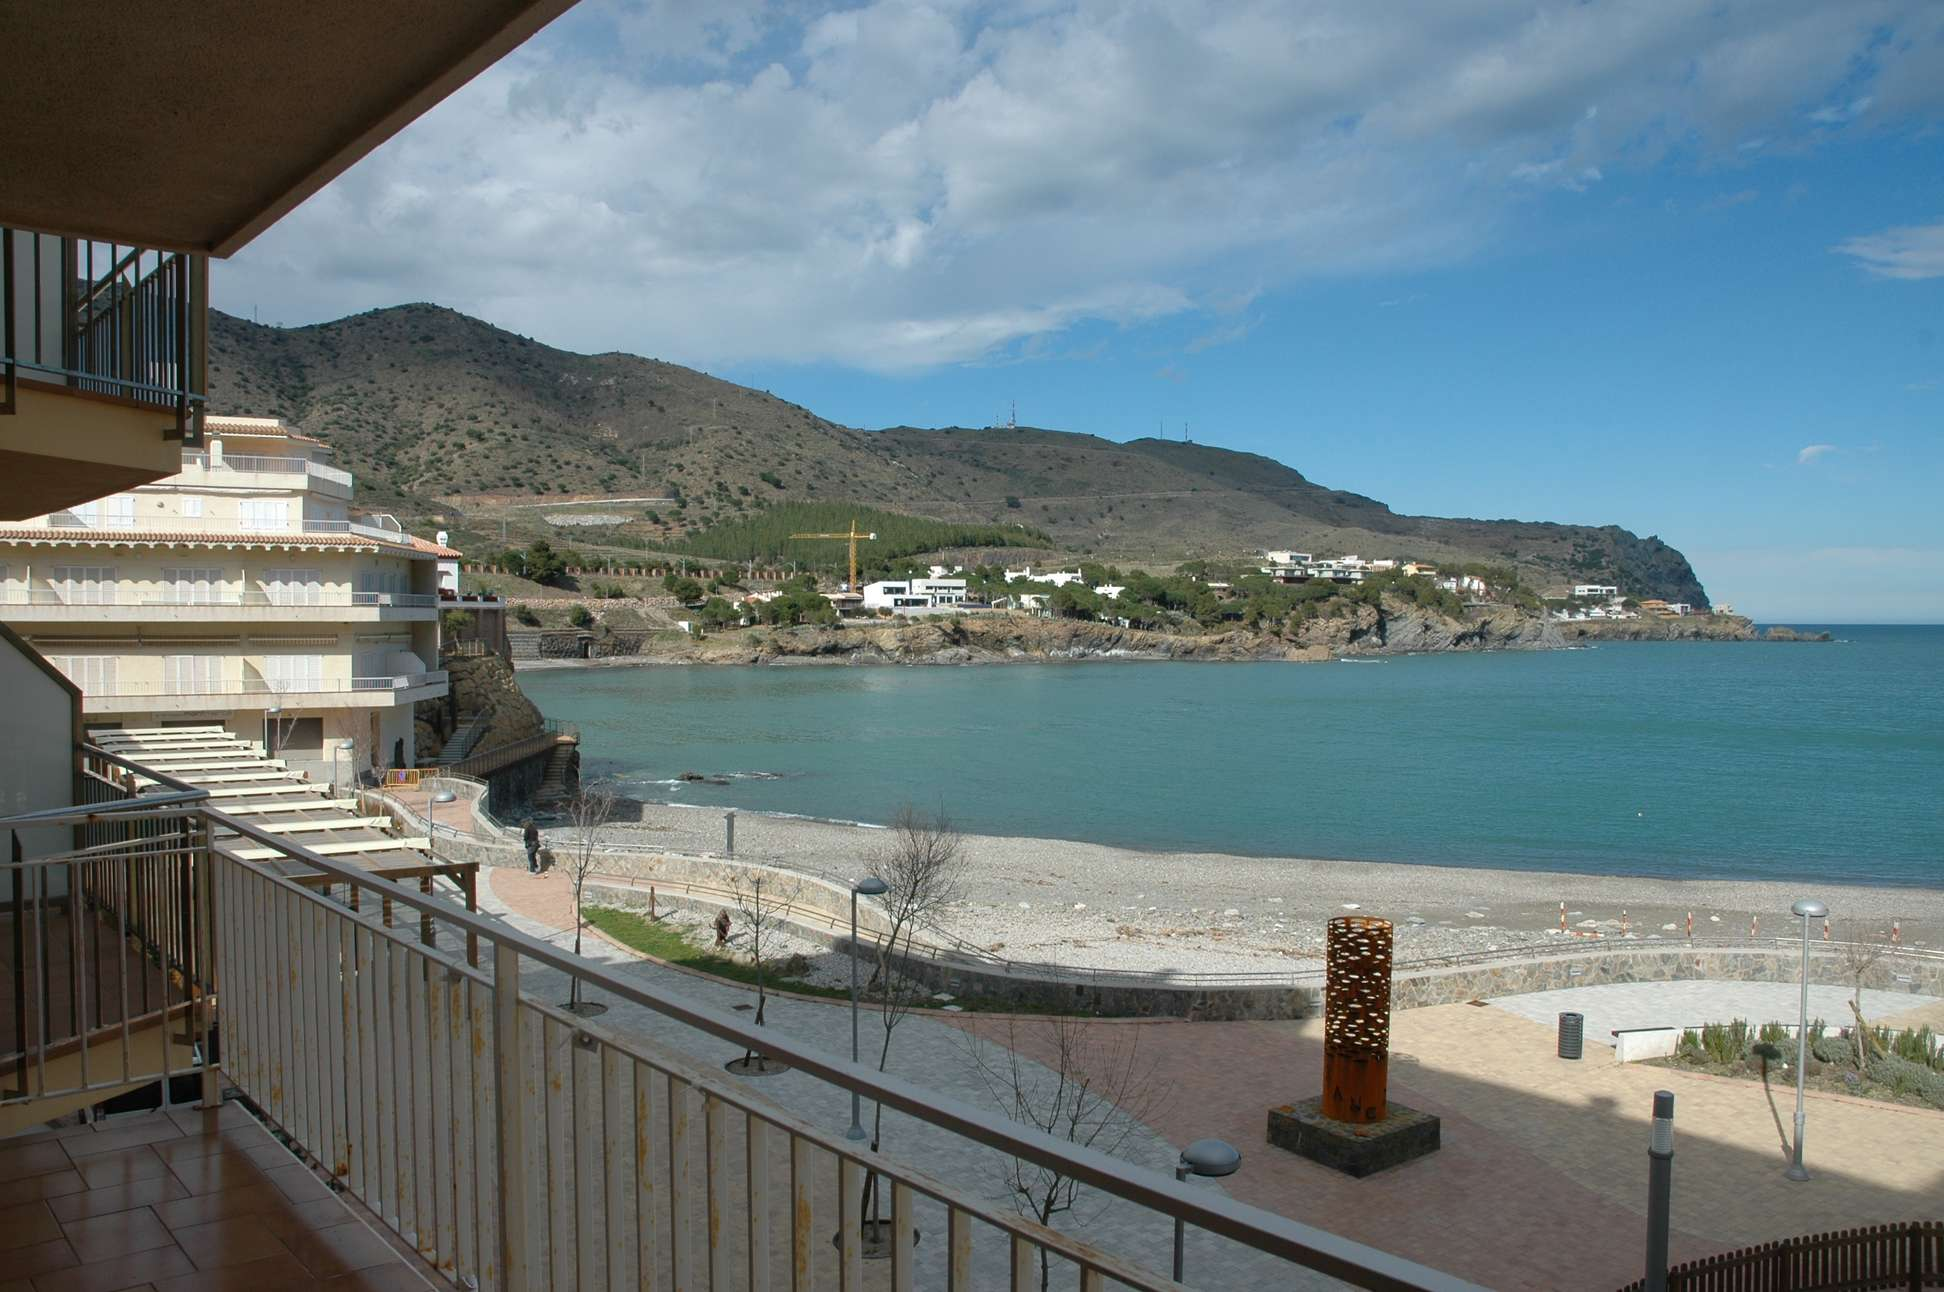 Venta piso renovado en primera linea de mar girona alt empord for Pisos alquiler alt emporda